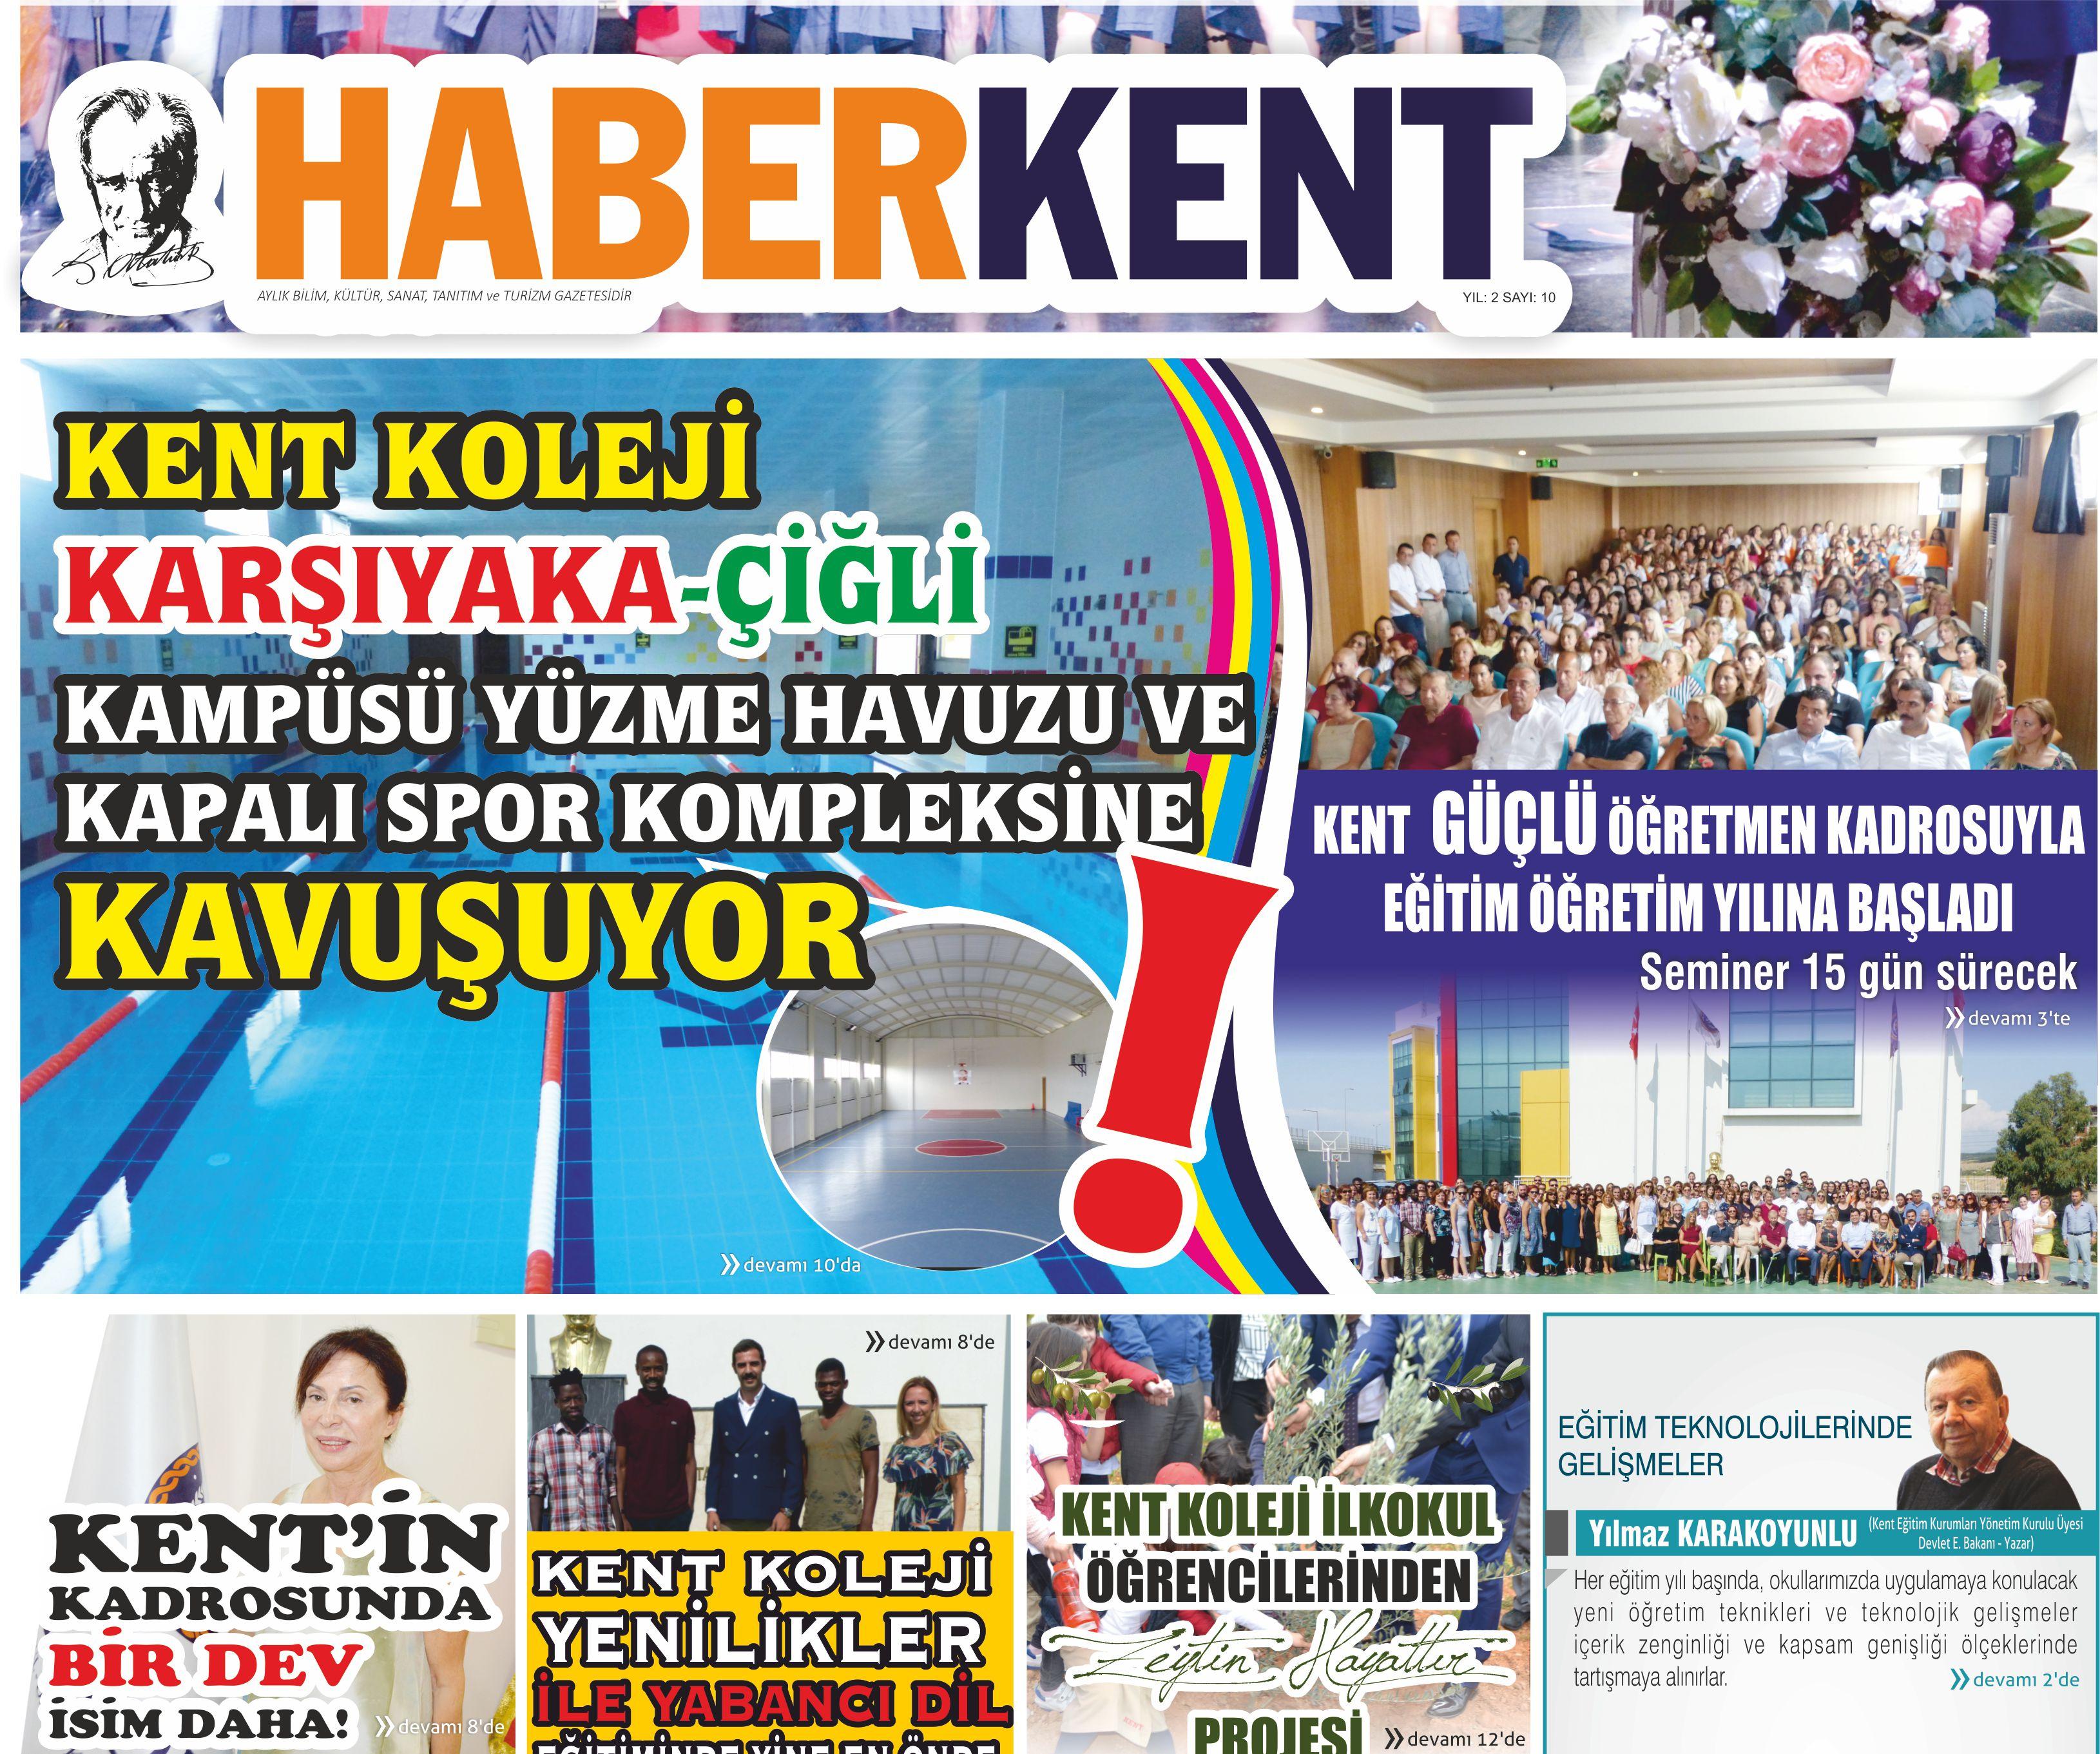 HABERKENT